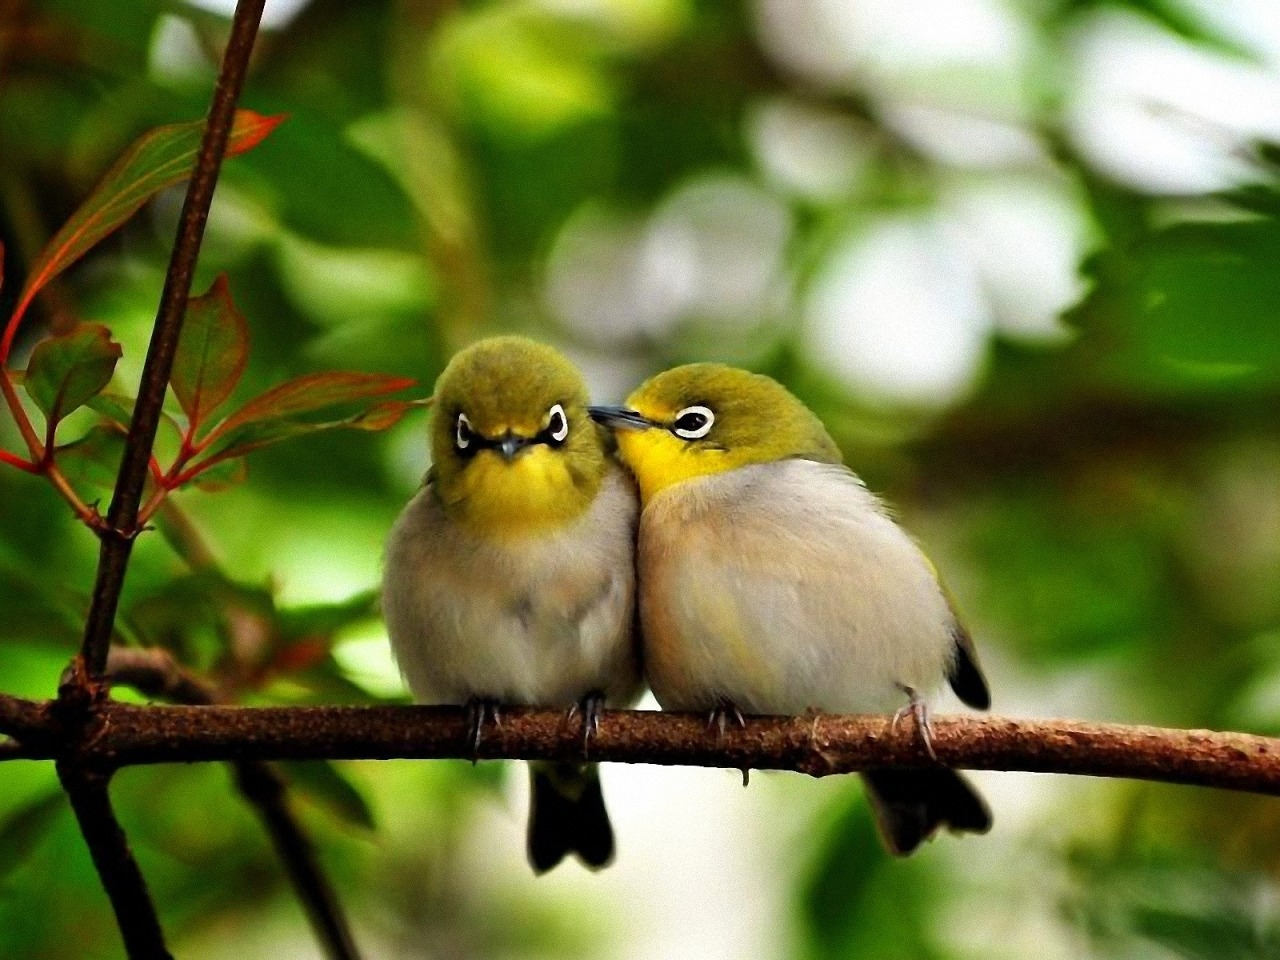 Cute Little Birds Background